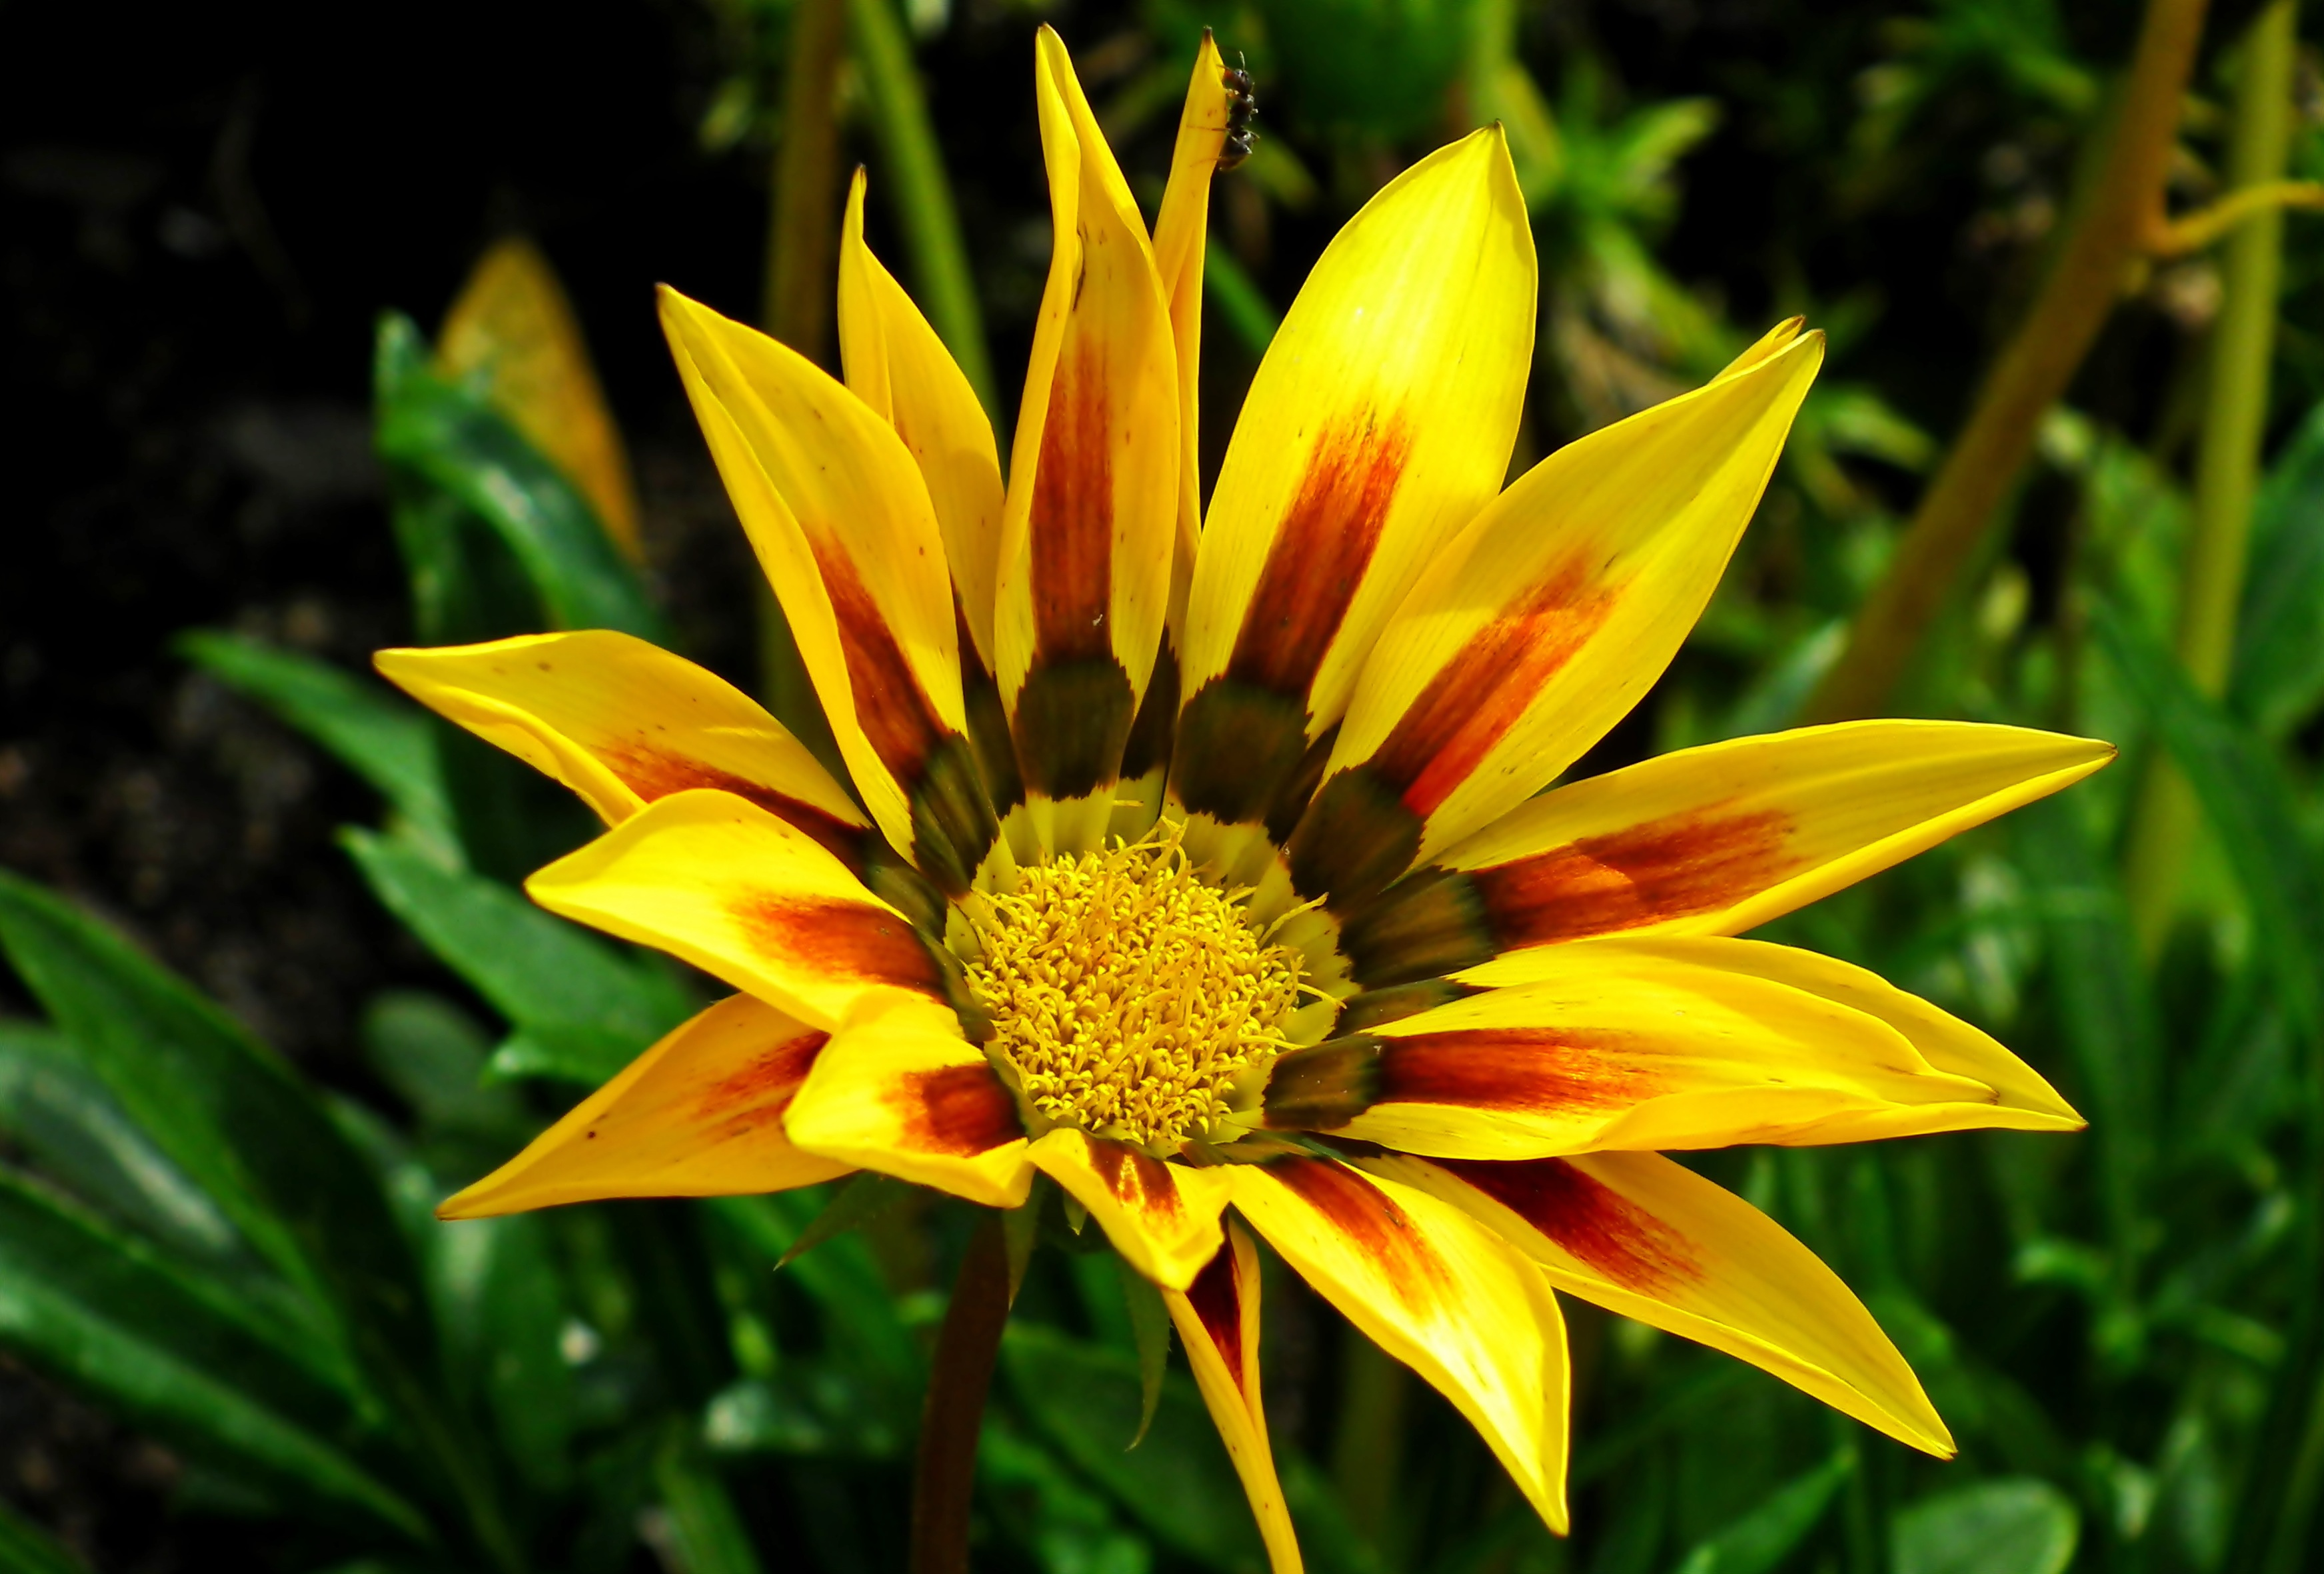 Фото желтых цветок Газания Крупным планом 3487x2361 Желтый желтые желтая Цветы вблизи